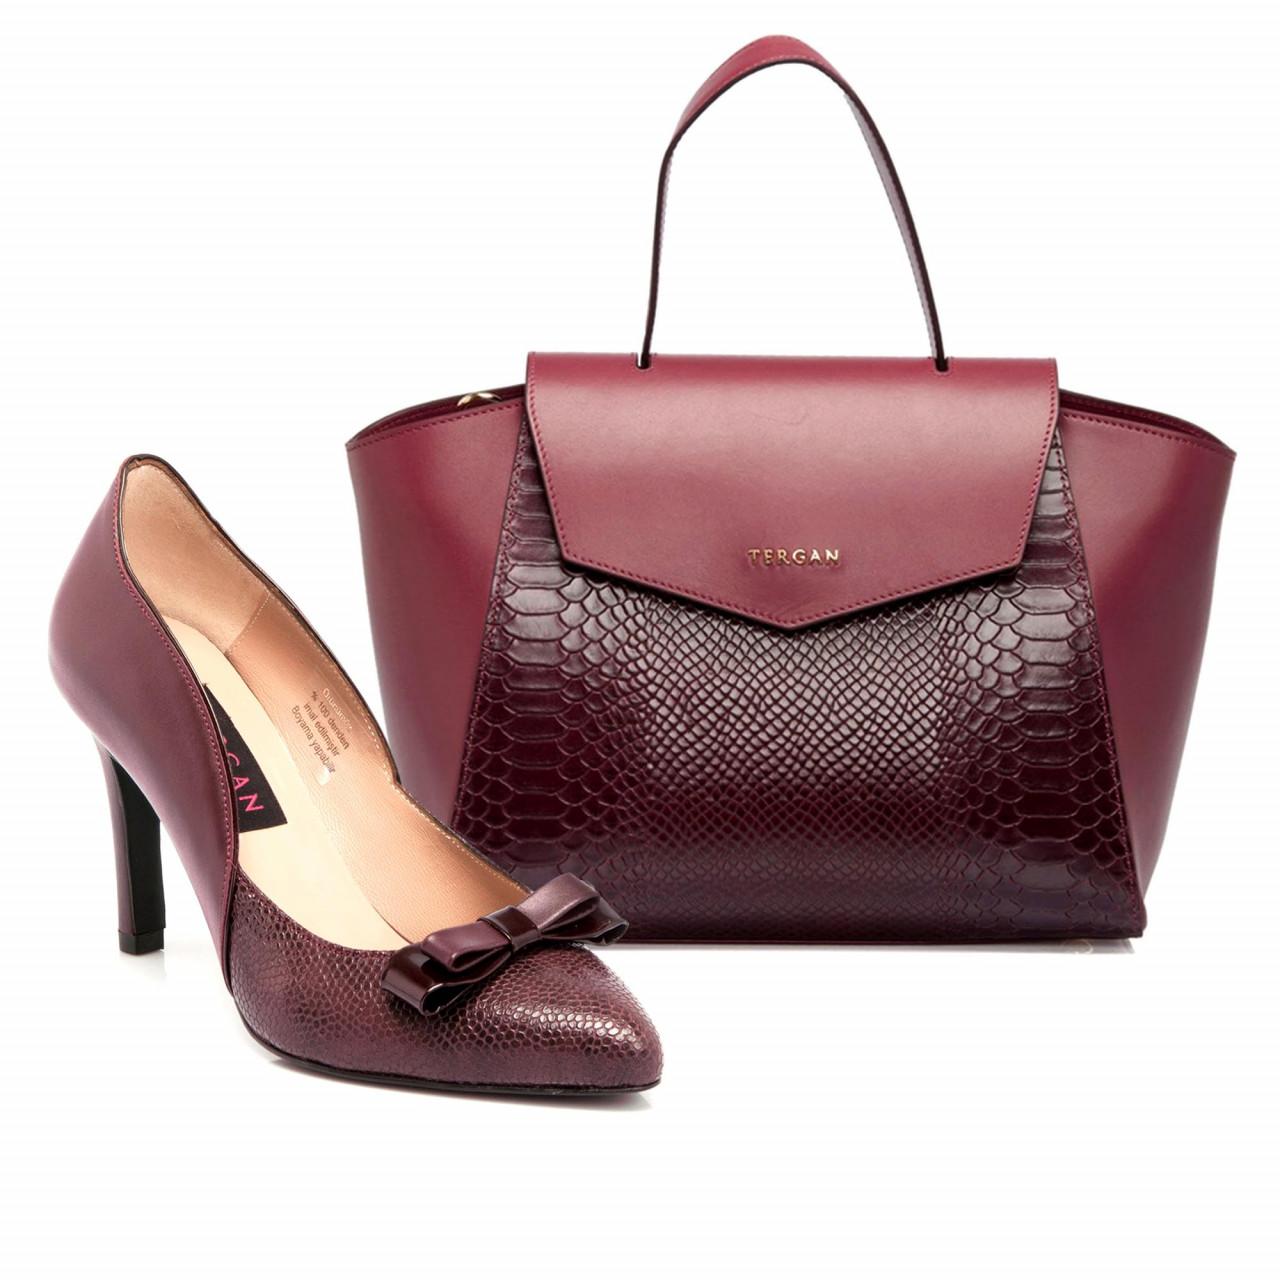 Луксозни дамска чанта и обувки в бордо